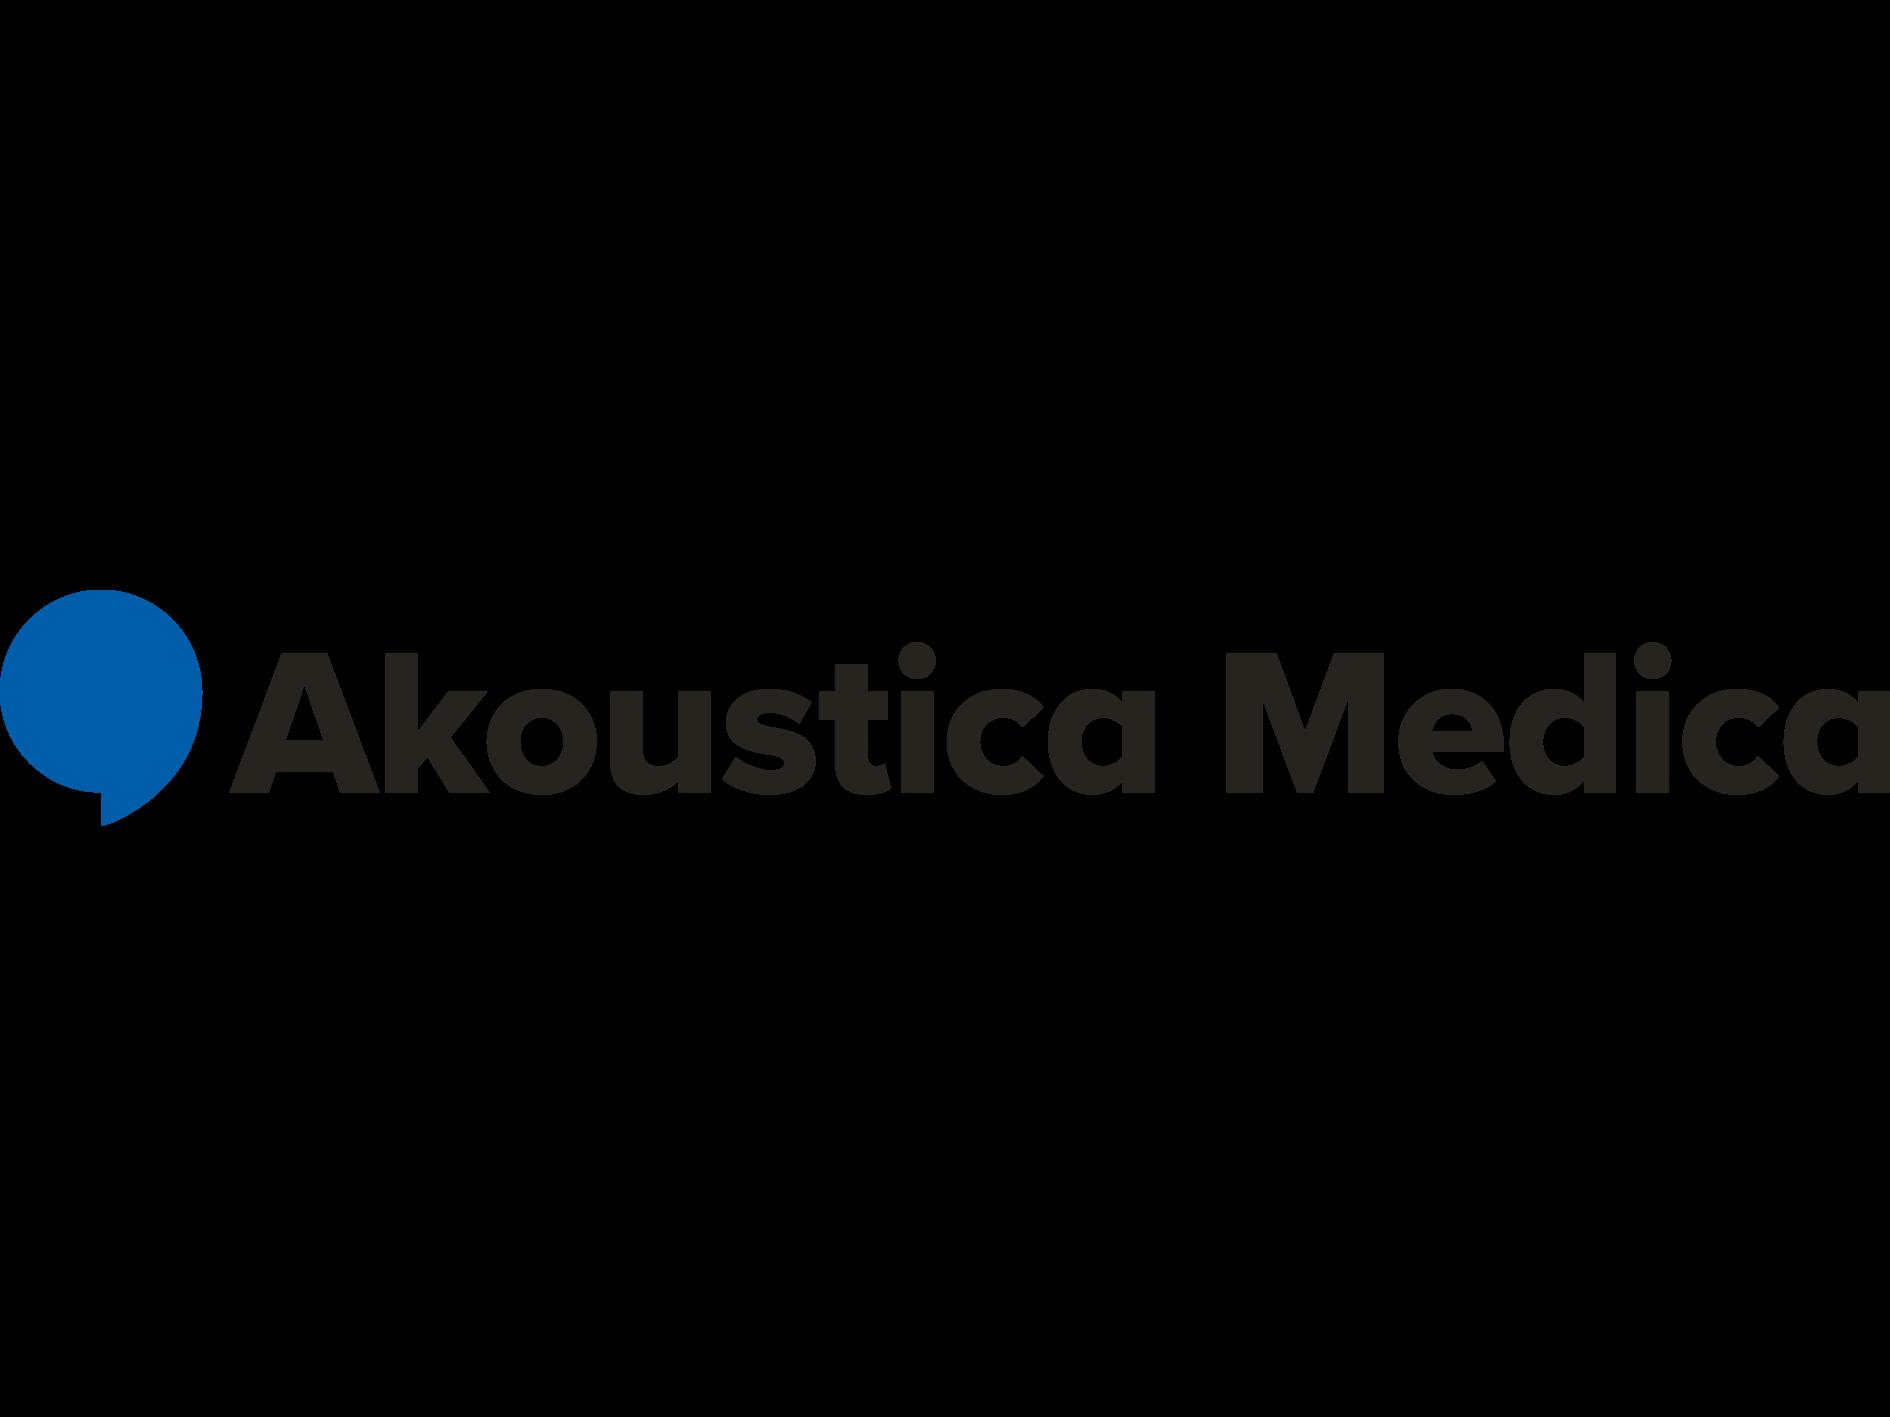 Acoustica Medica_Transparent